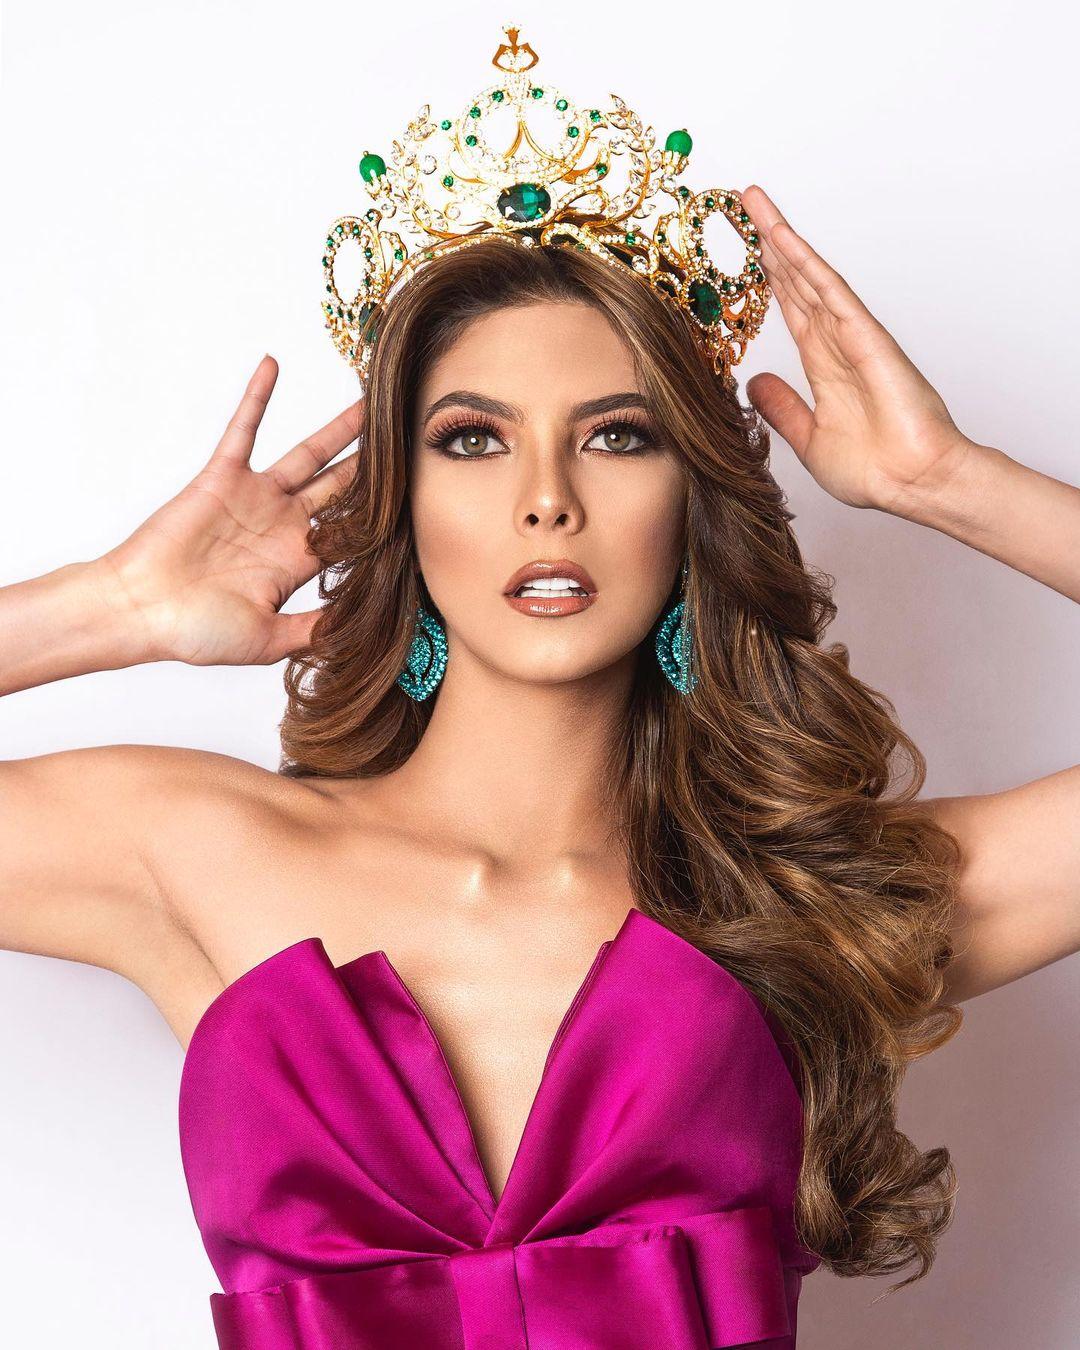 natalia manrique, miss grand colombia 2020. - Página 3 Yeyyv10